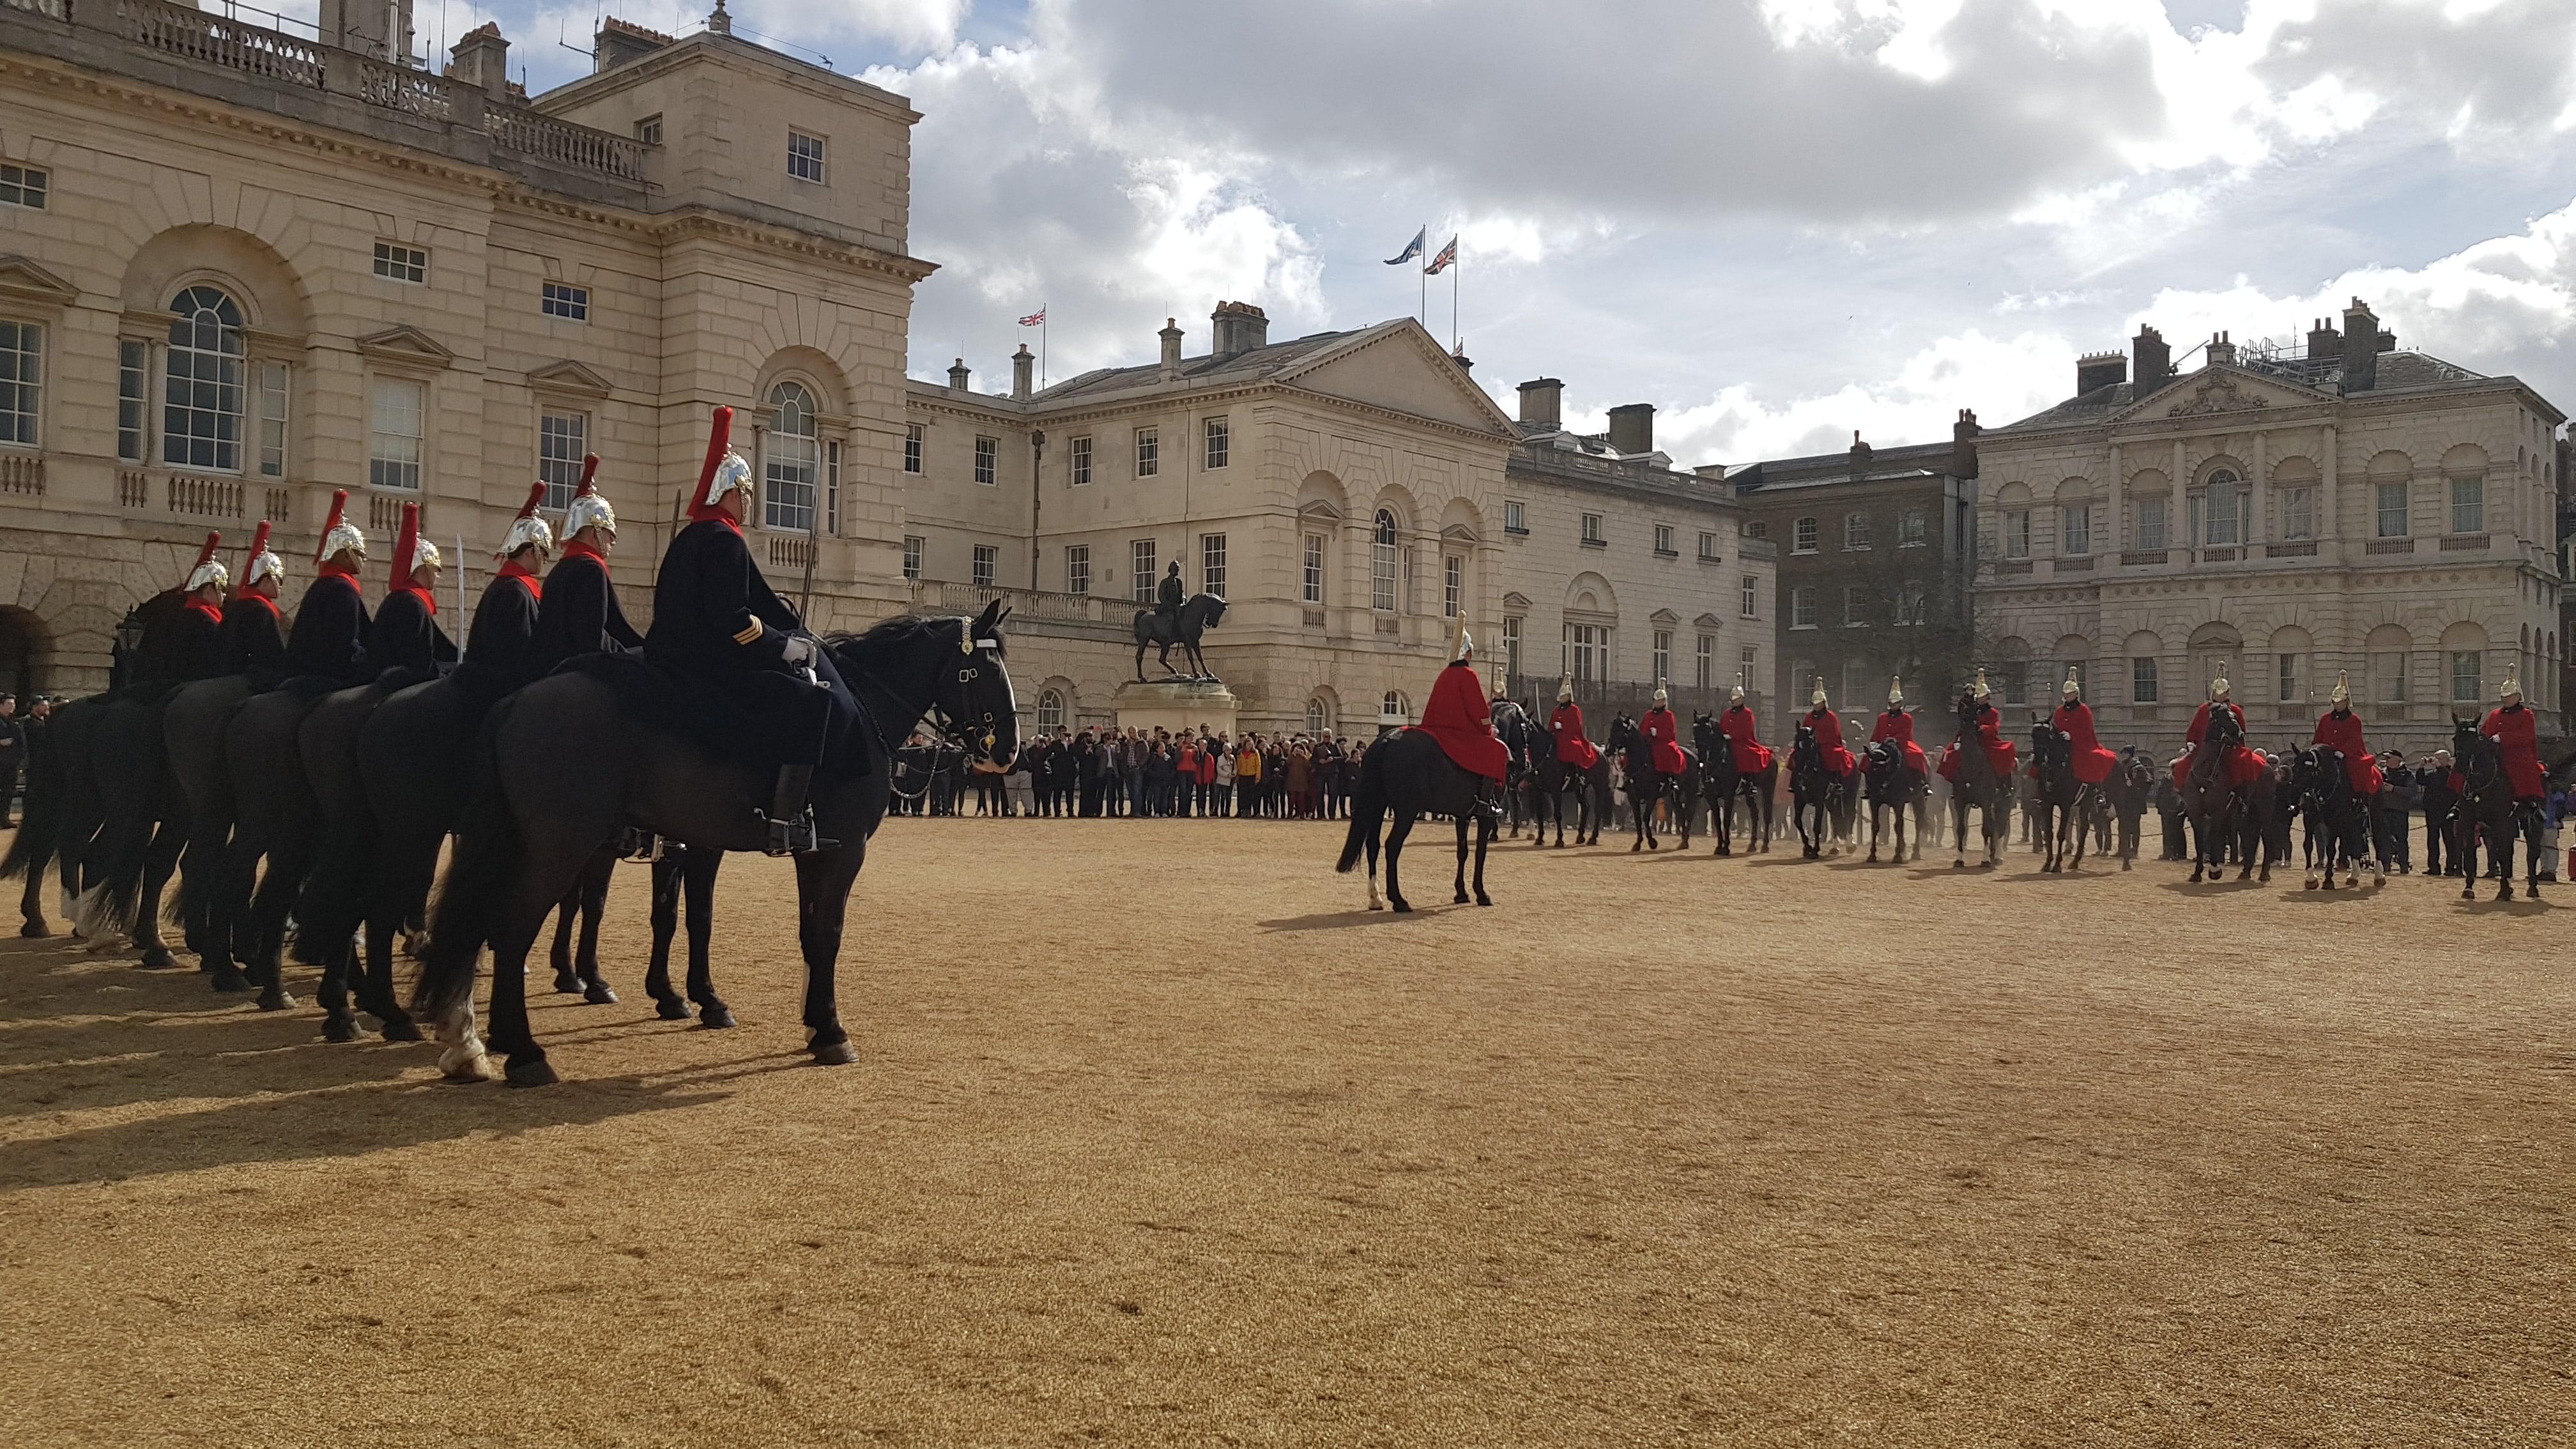 Cambio della guardia a Buckingham Palace Londra - Francesco Iodice-min